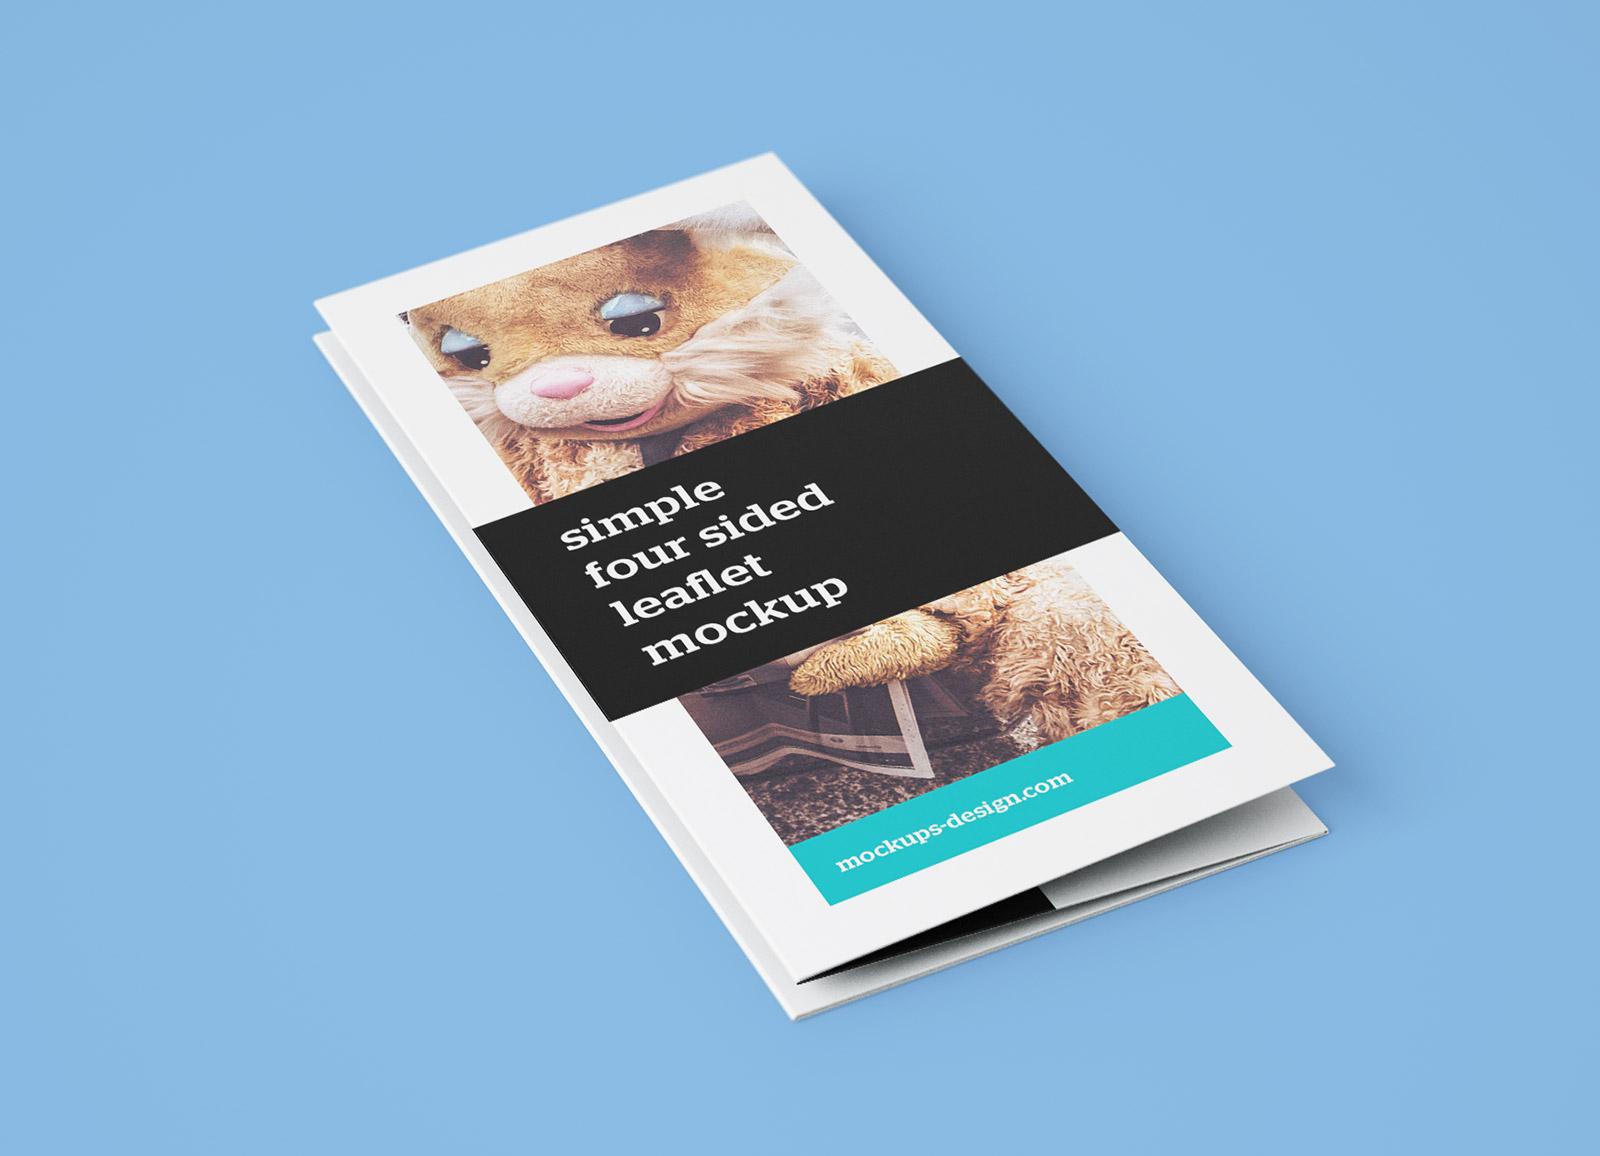 Free Accordion 4-Fold Brochure Leaflet Mockup PSD Templates (5)